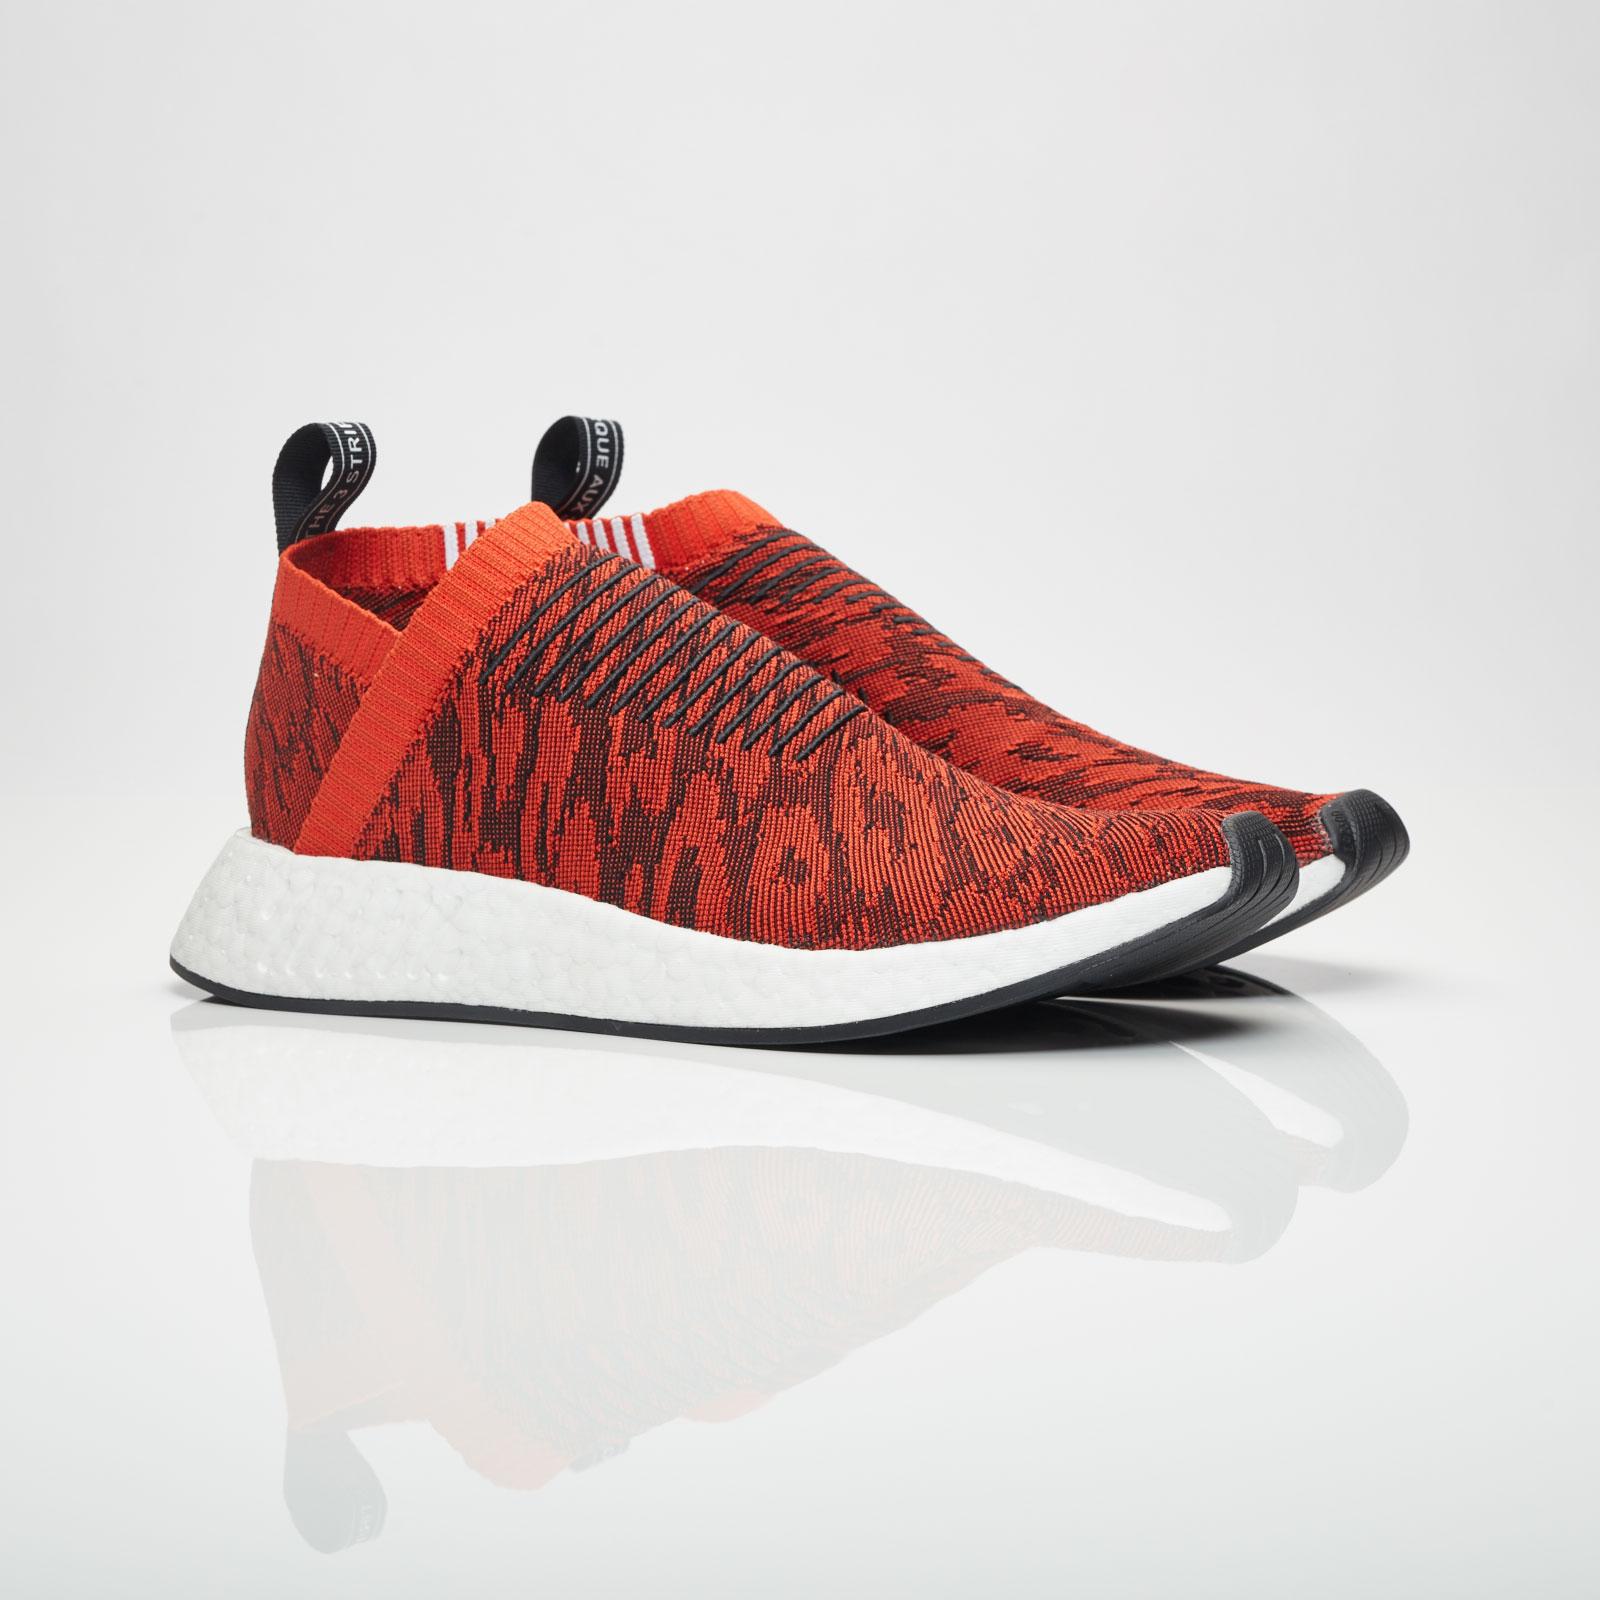 b336786411828 adidas NMD CS2 PK - By9406 - Sneakersnstuff